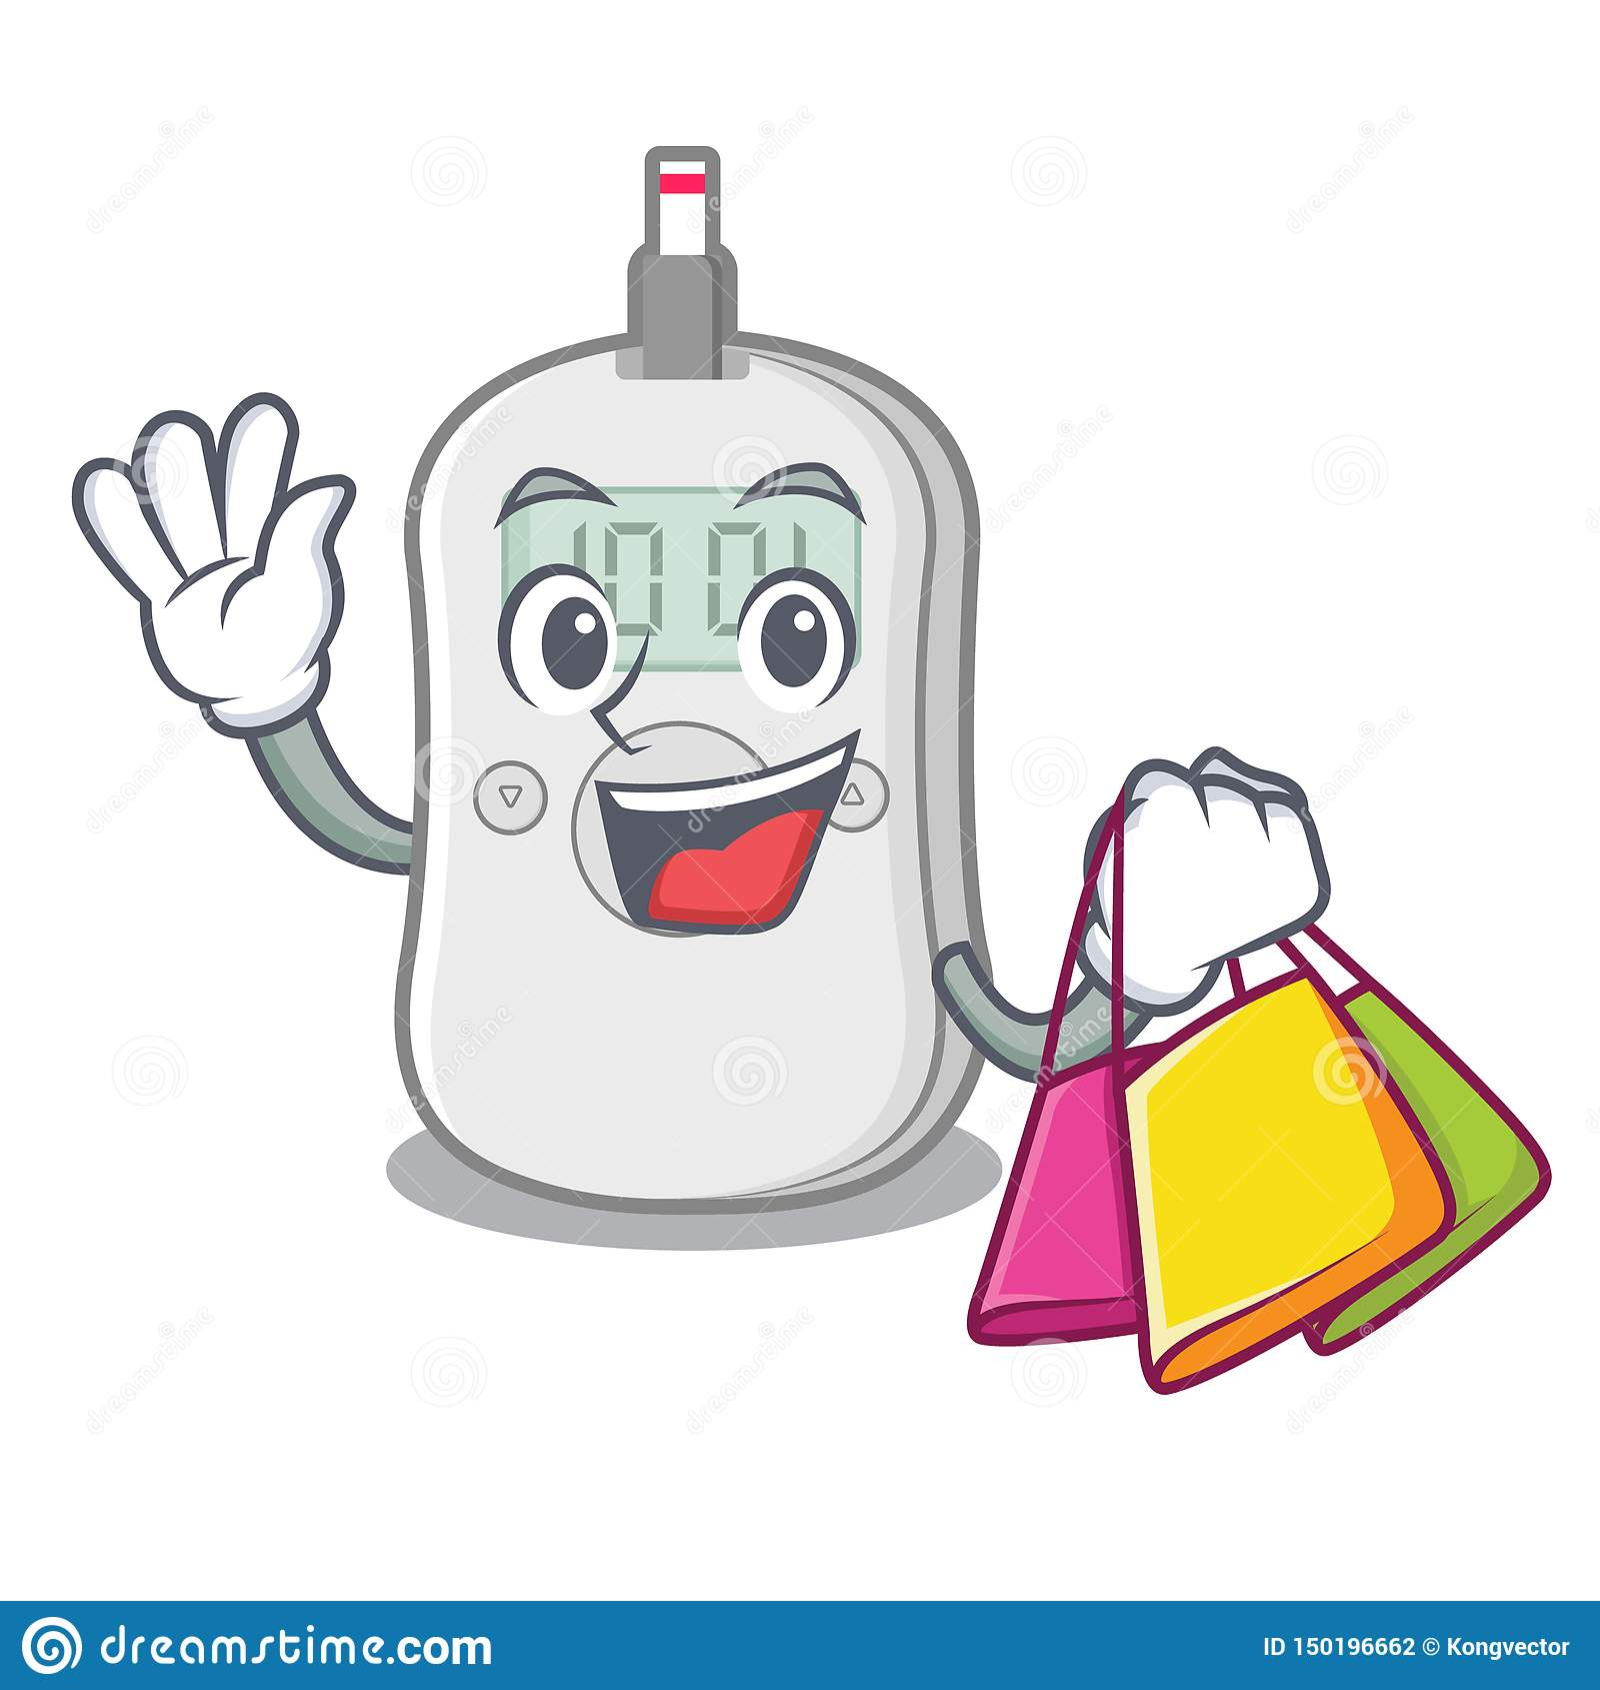 Shopping diabetes check machine isolated the cartoon